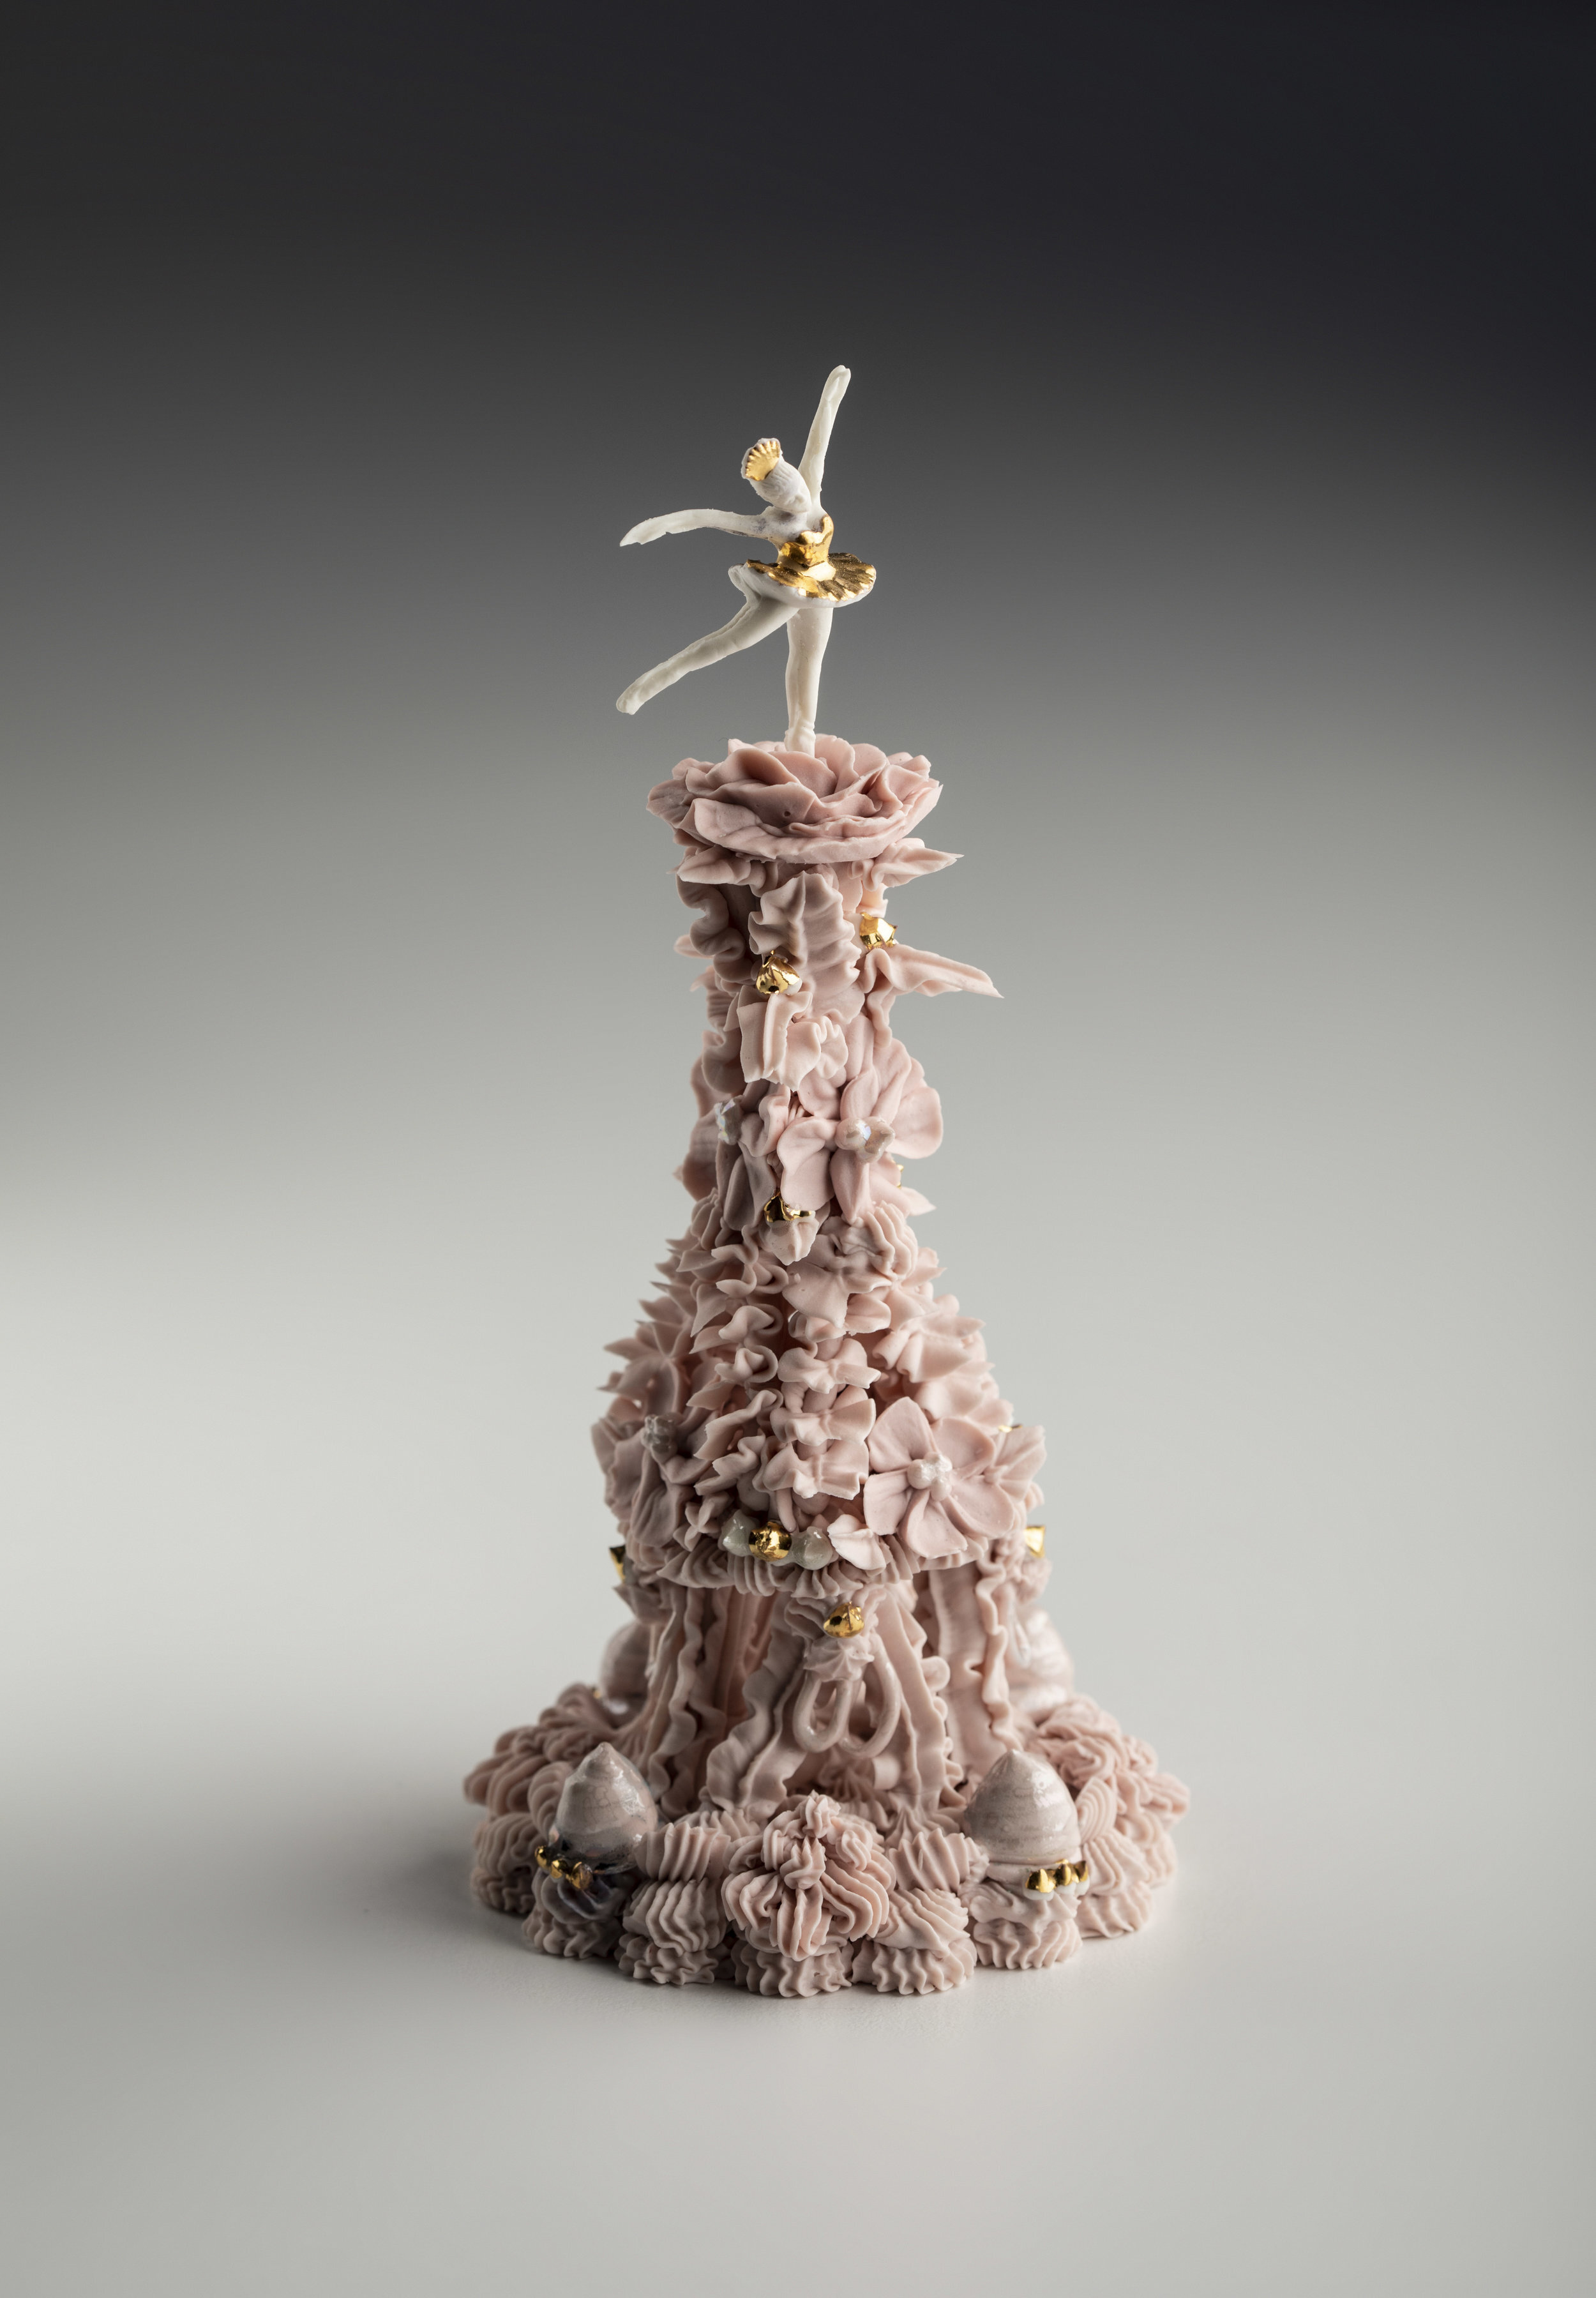 Ebony Russell, Ballerina Figure, 2019. porcelain, lustre. Photo credit Karl   Schwerdtfeger